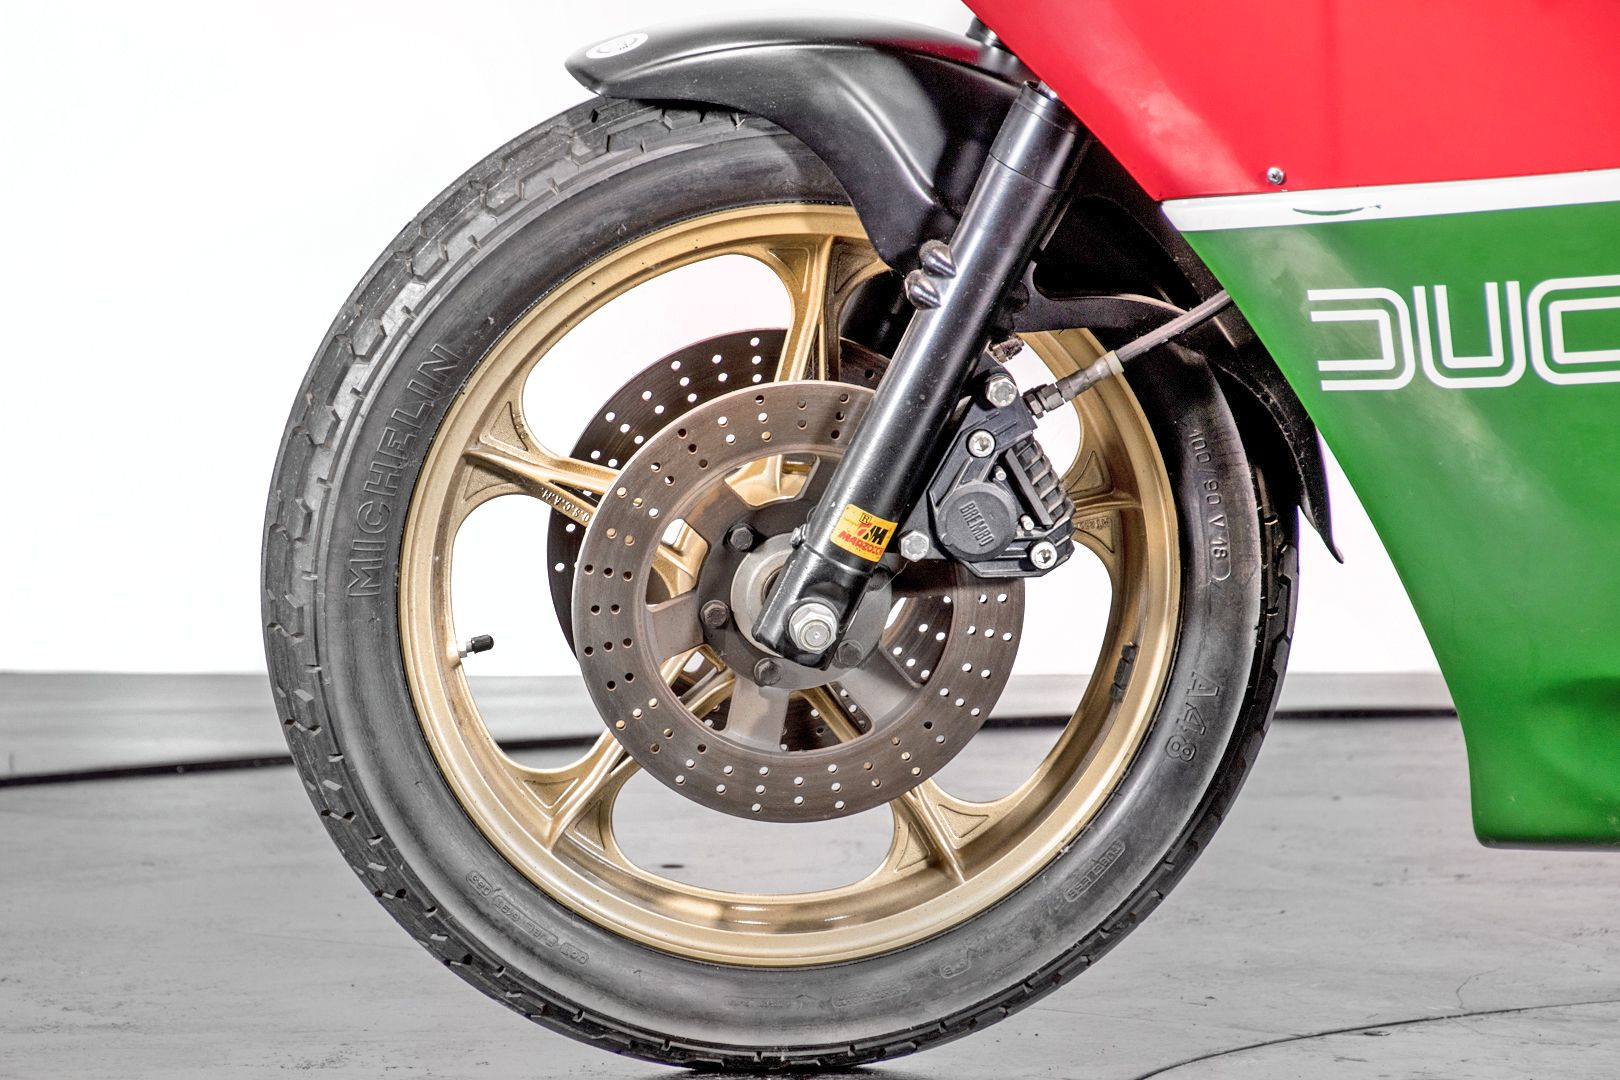 1984 Ducati 900 Mike Hailwood Replica 81556